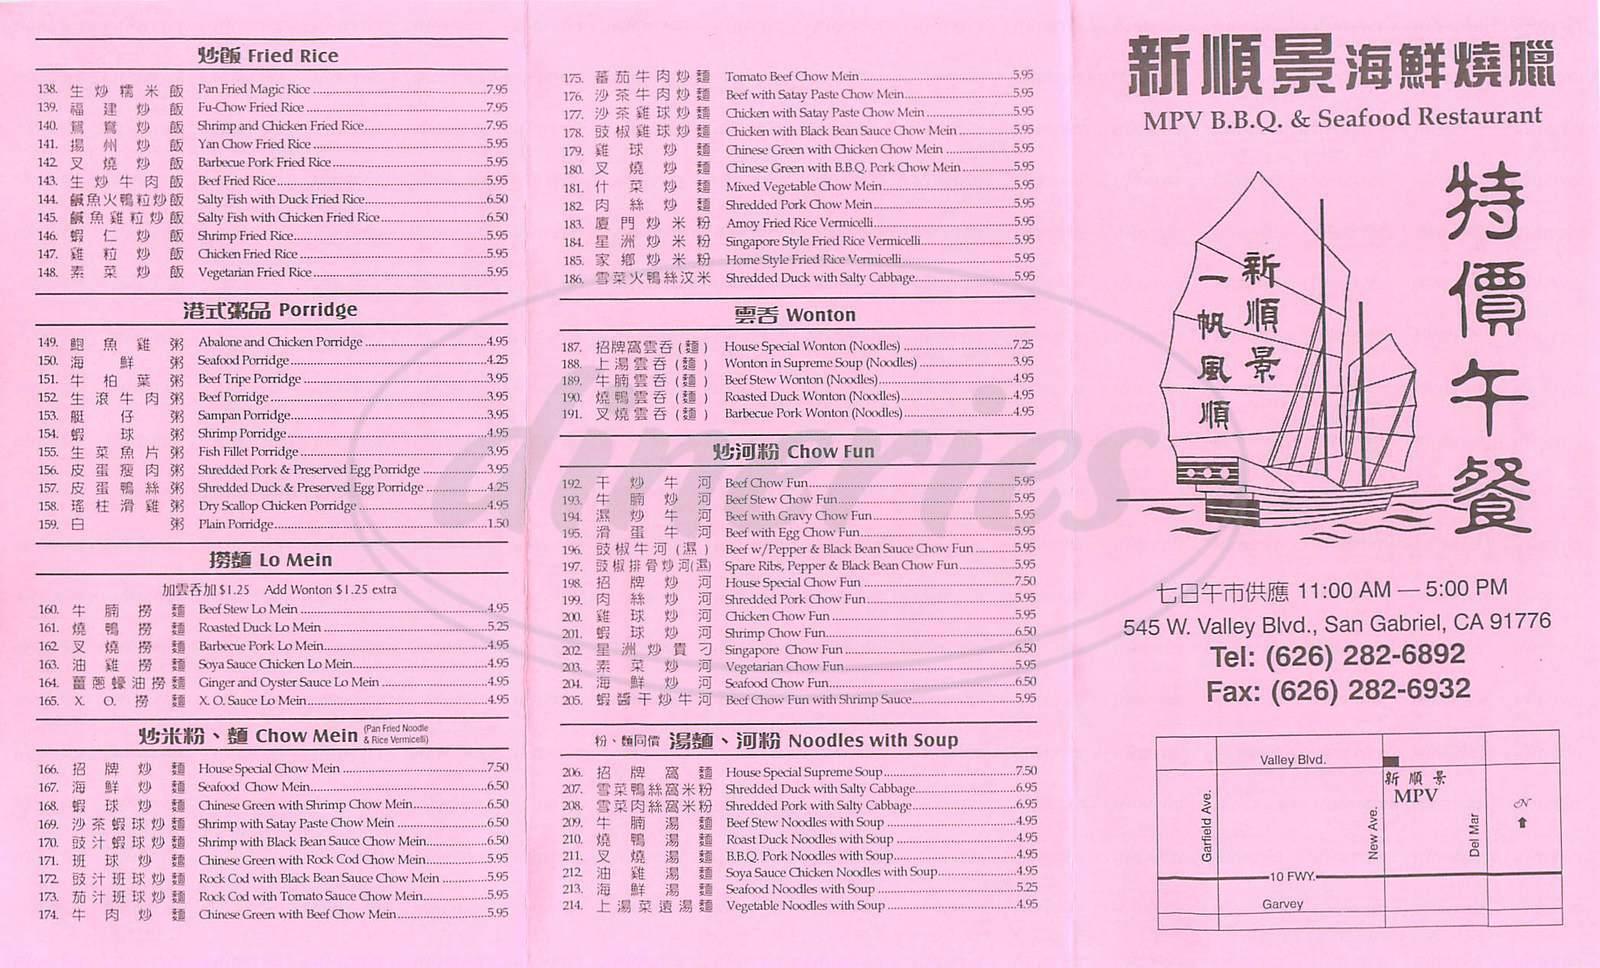 menu for MPV Bbq Seafood Restaurant